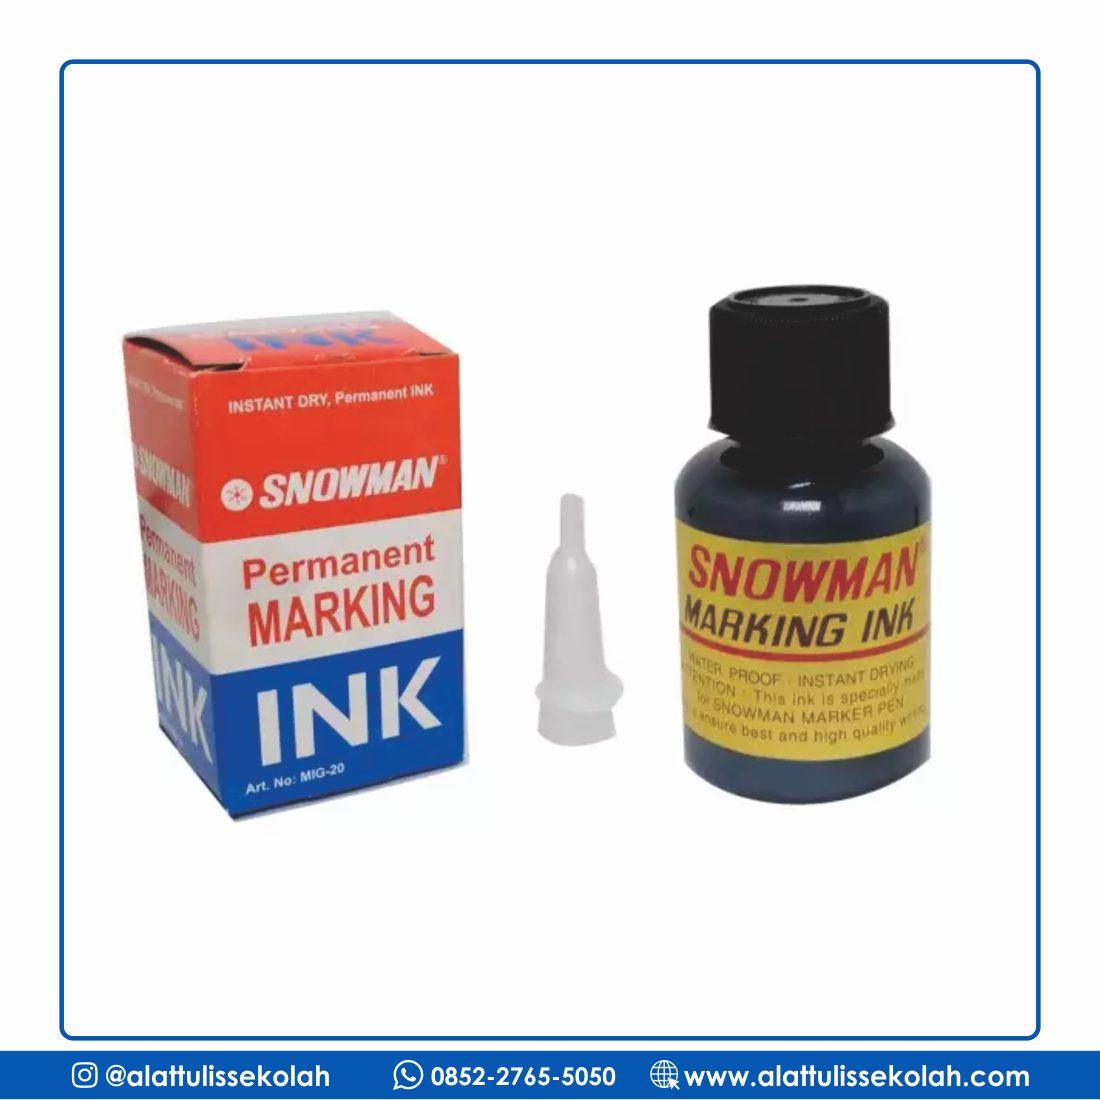 [Permanent Marking] Tinta Spidol Permanen Hitam